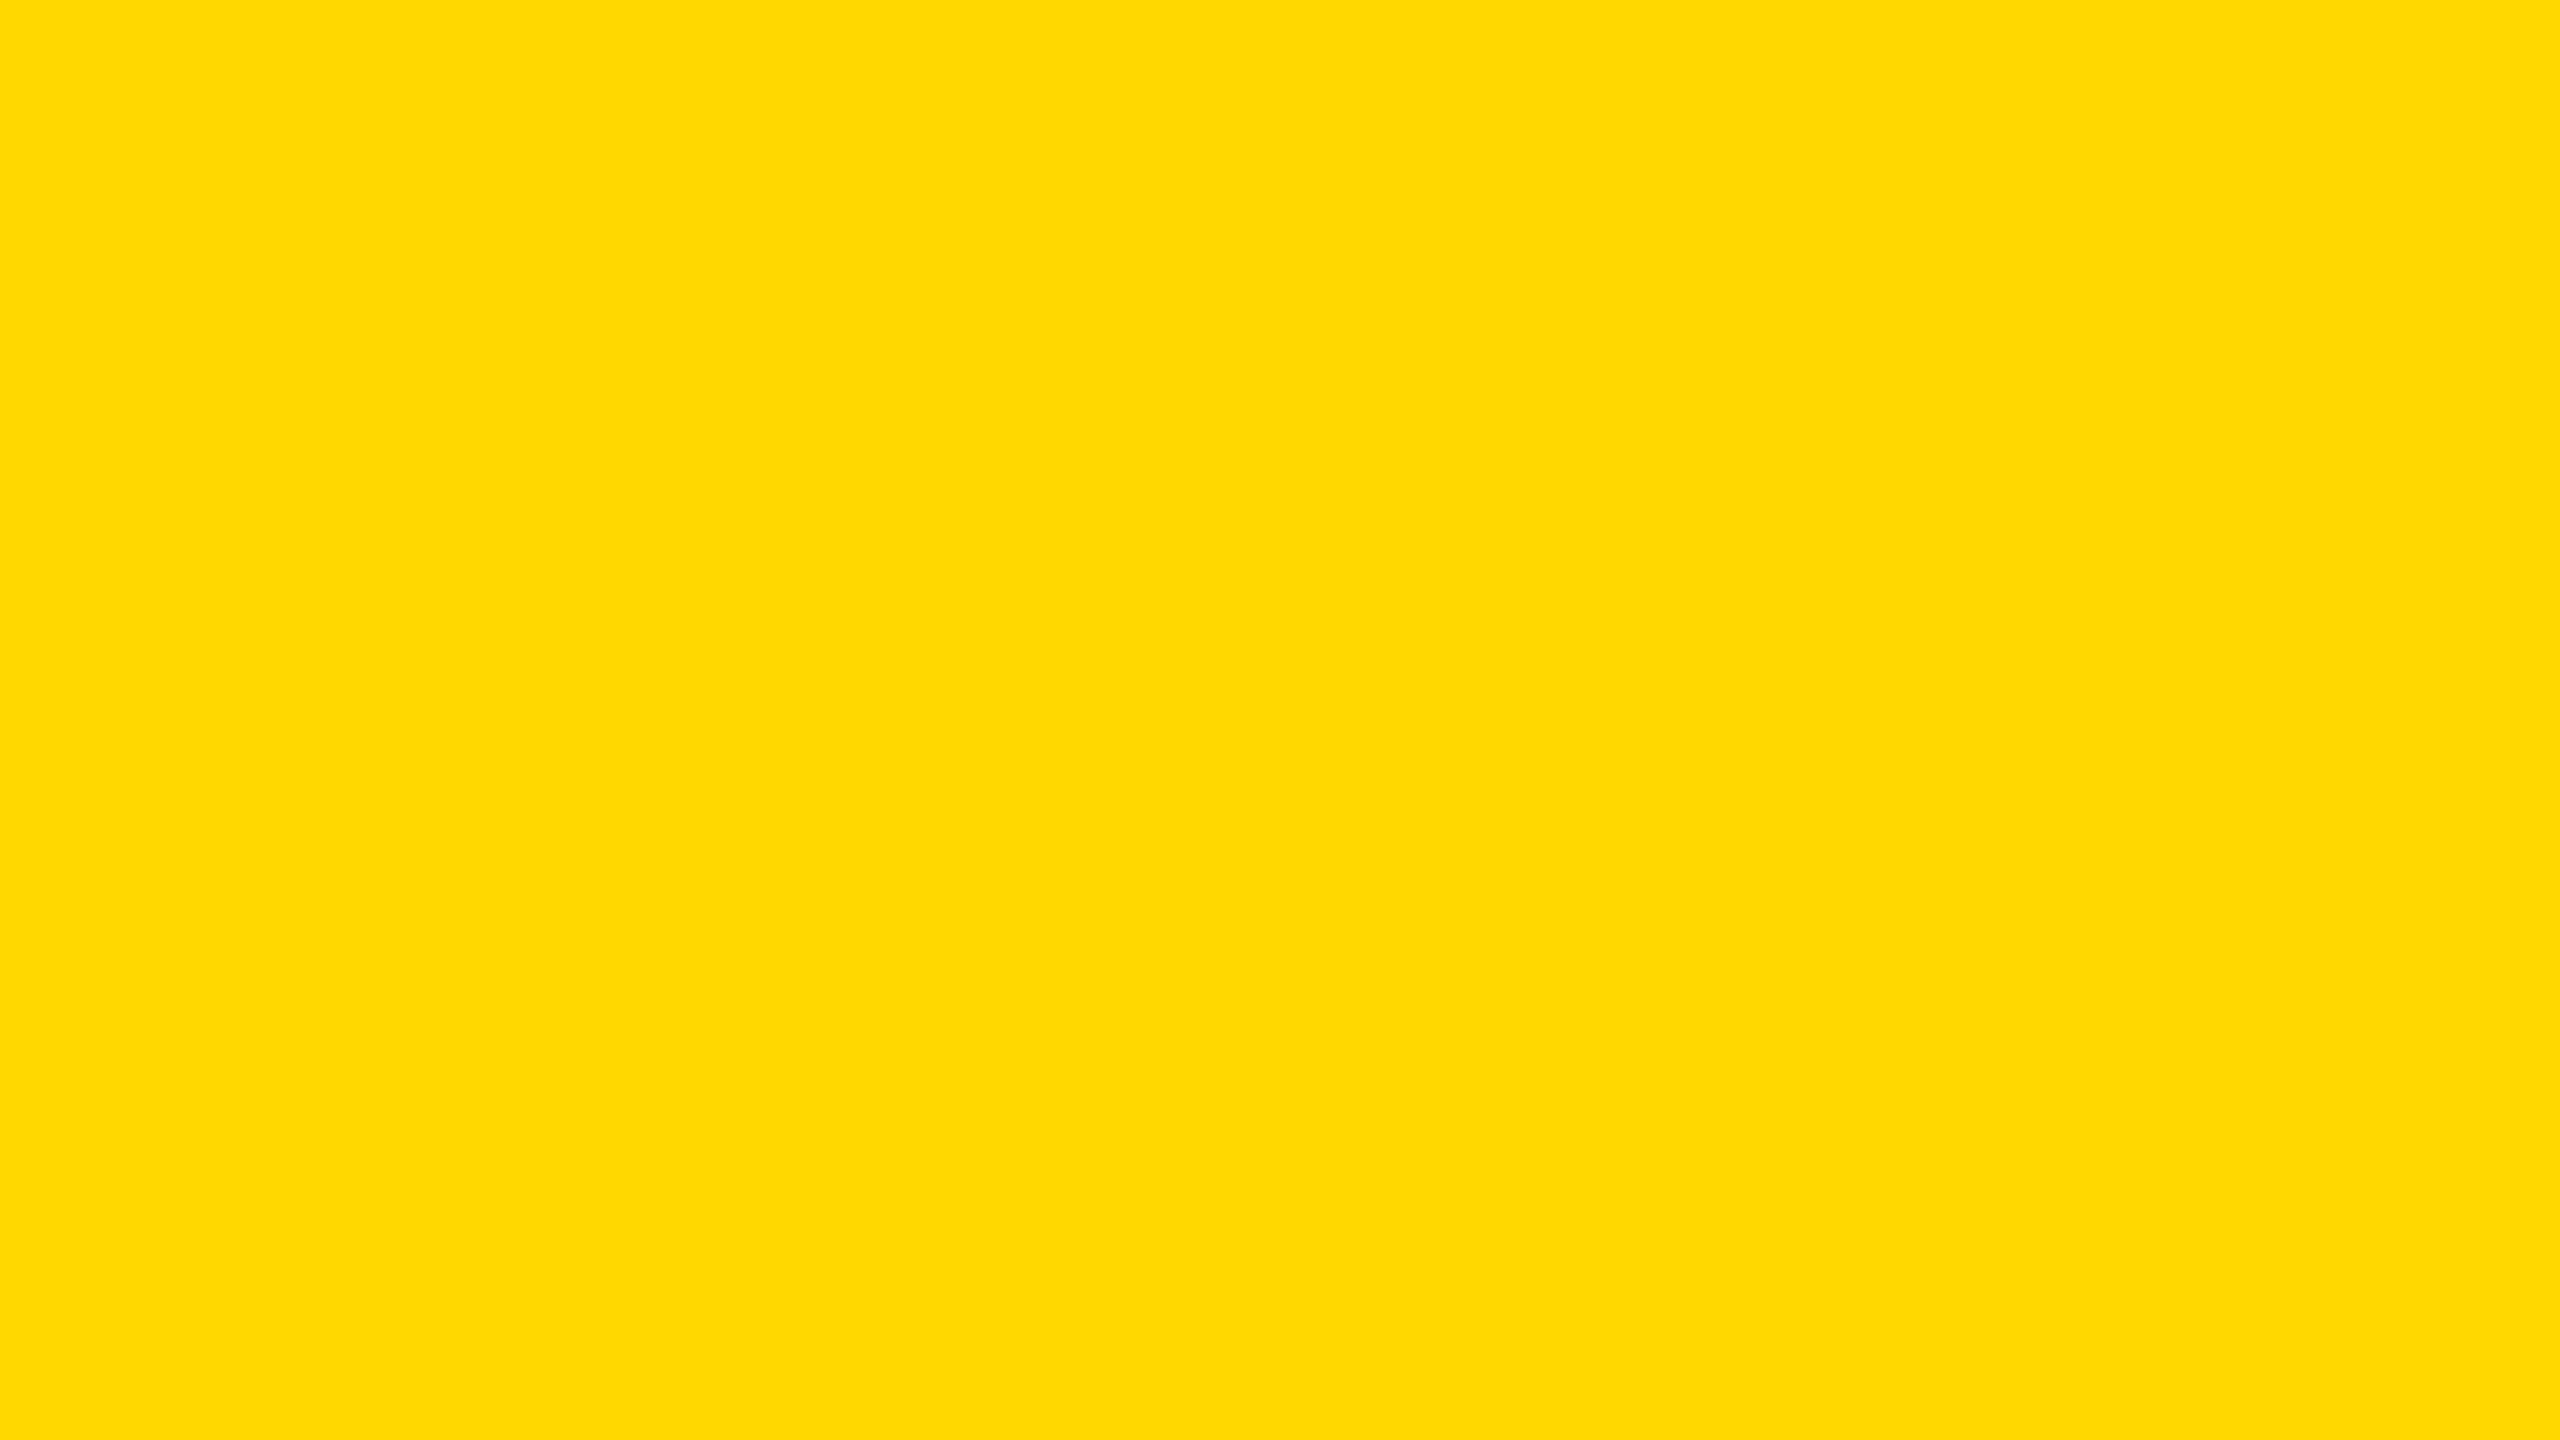 yellow aesthetic mac wallpapers top